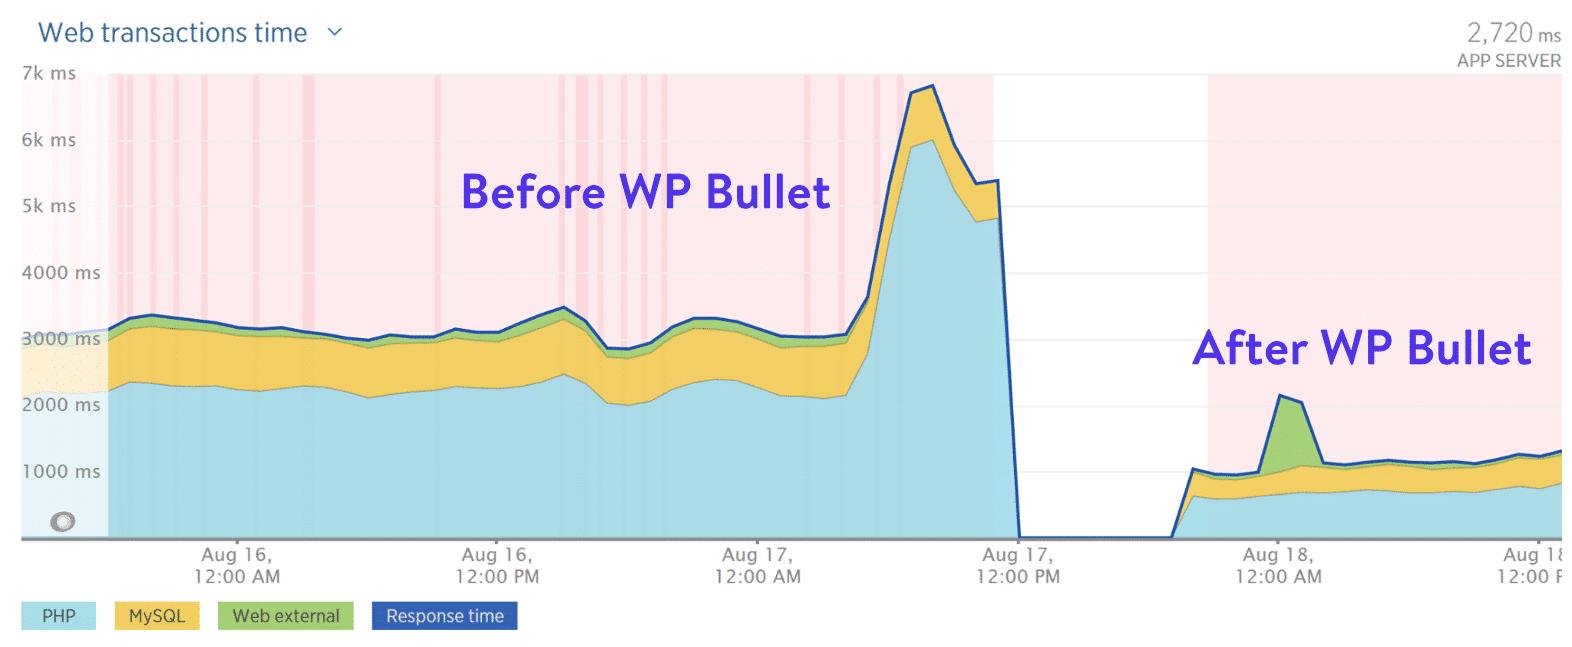 Antes e depois do WP Bullet